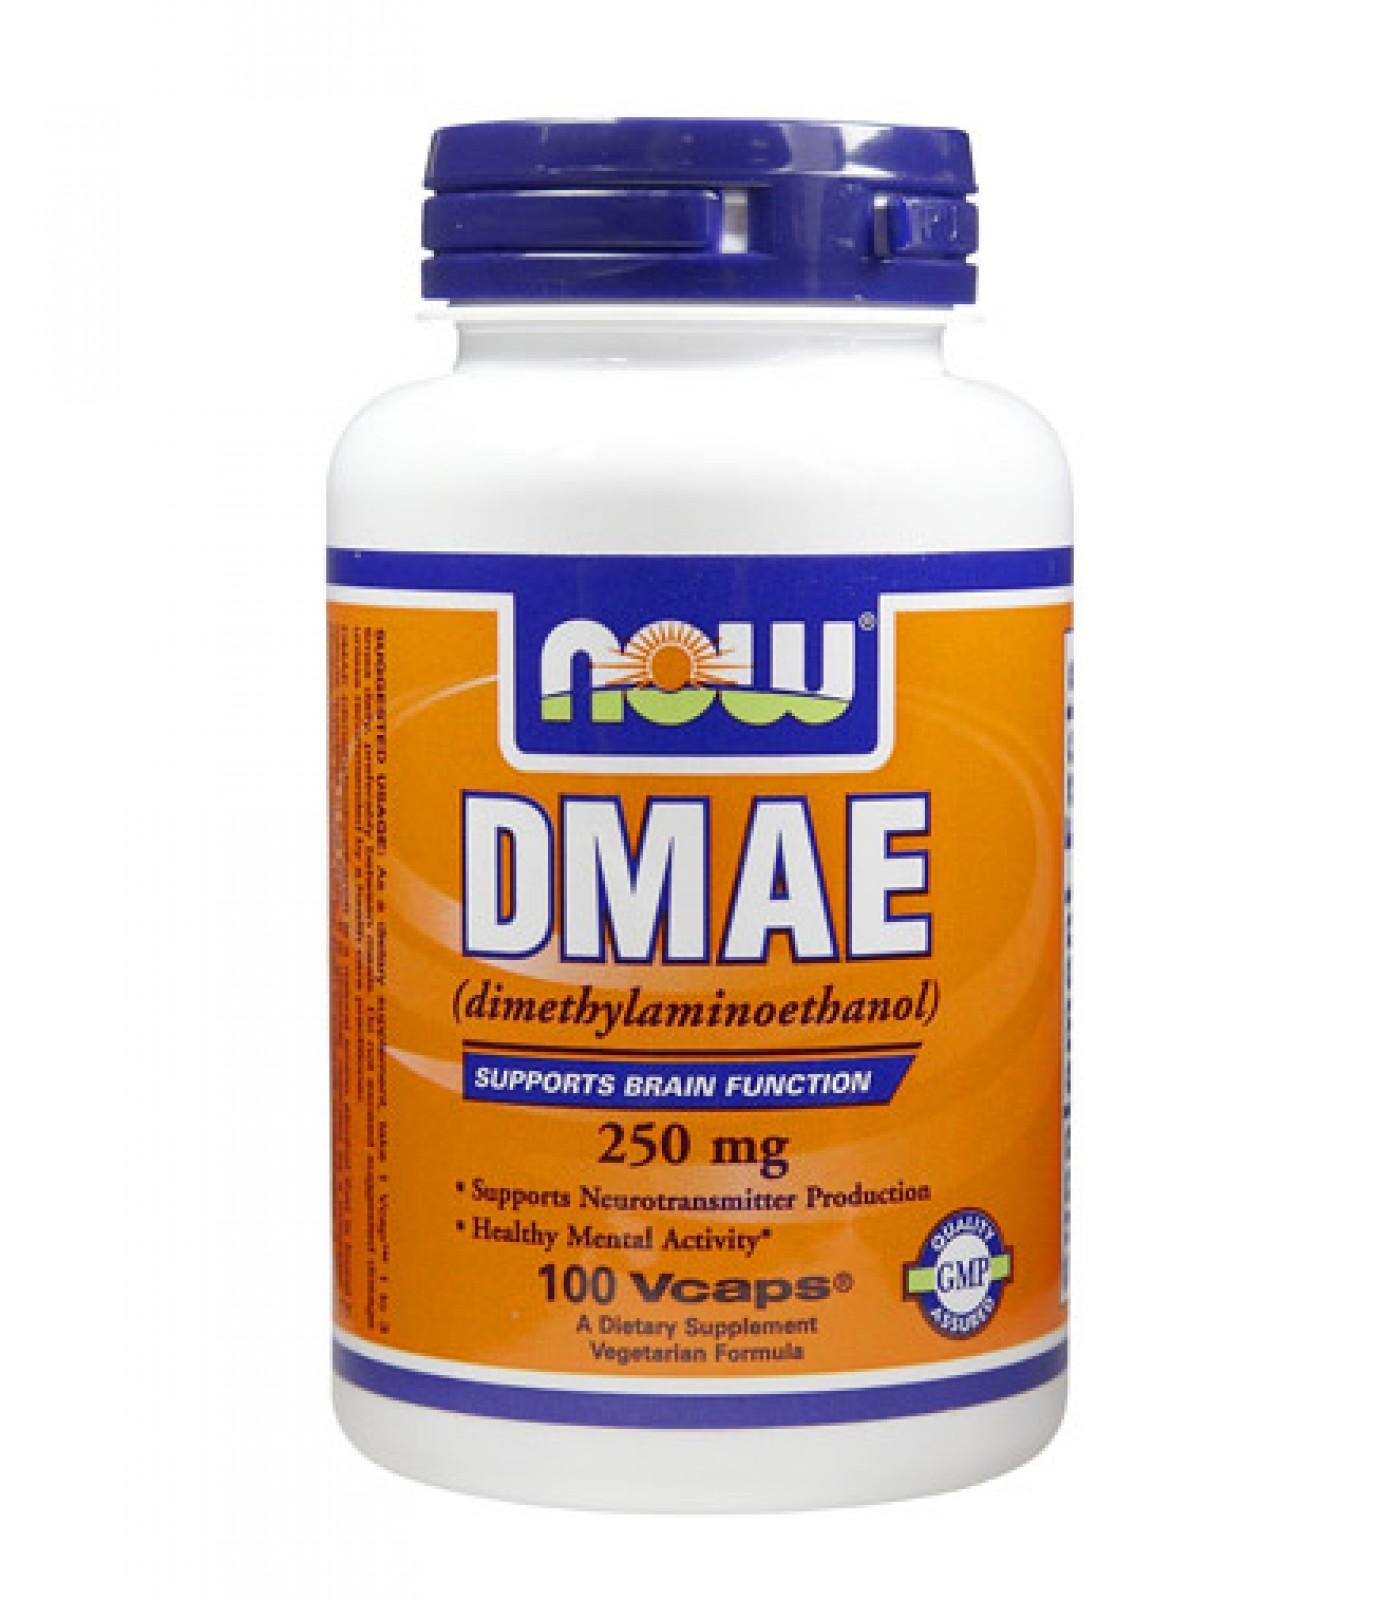 NOW - DMAE 250mg. / 100 Caps.